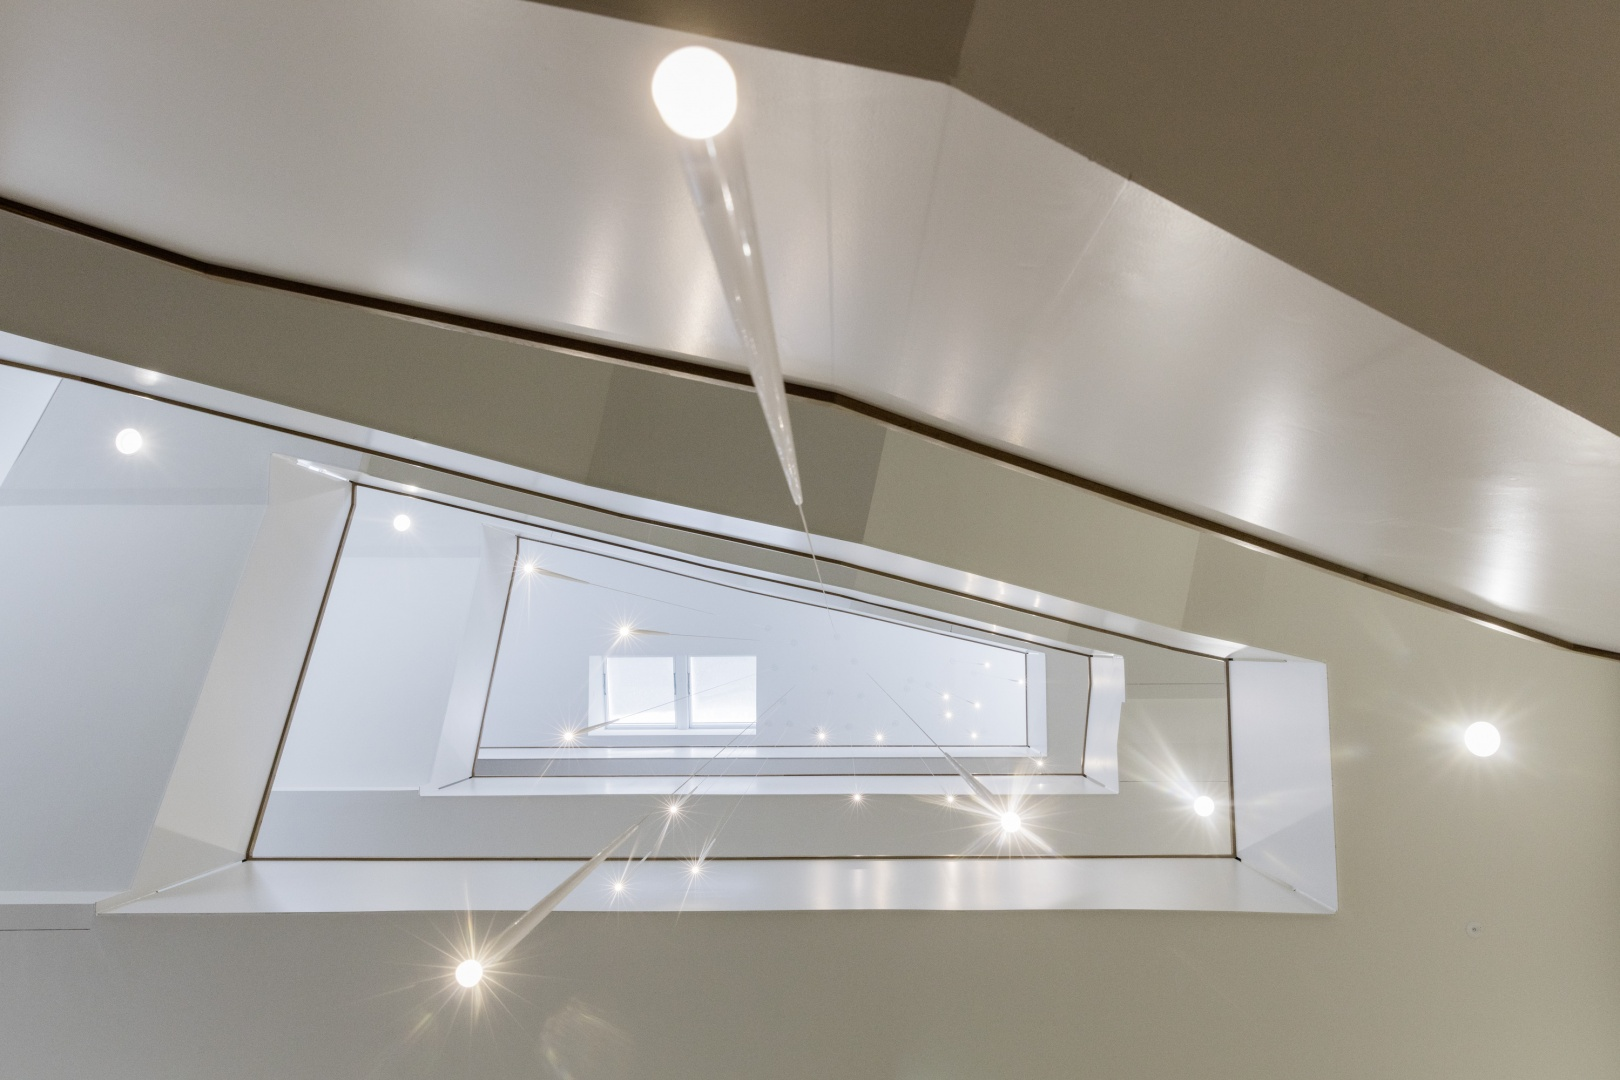 Haupttreppenhaus  © Berit Klinik